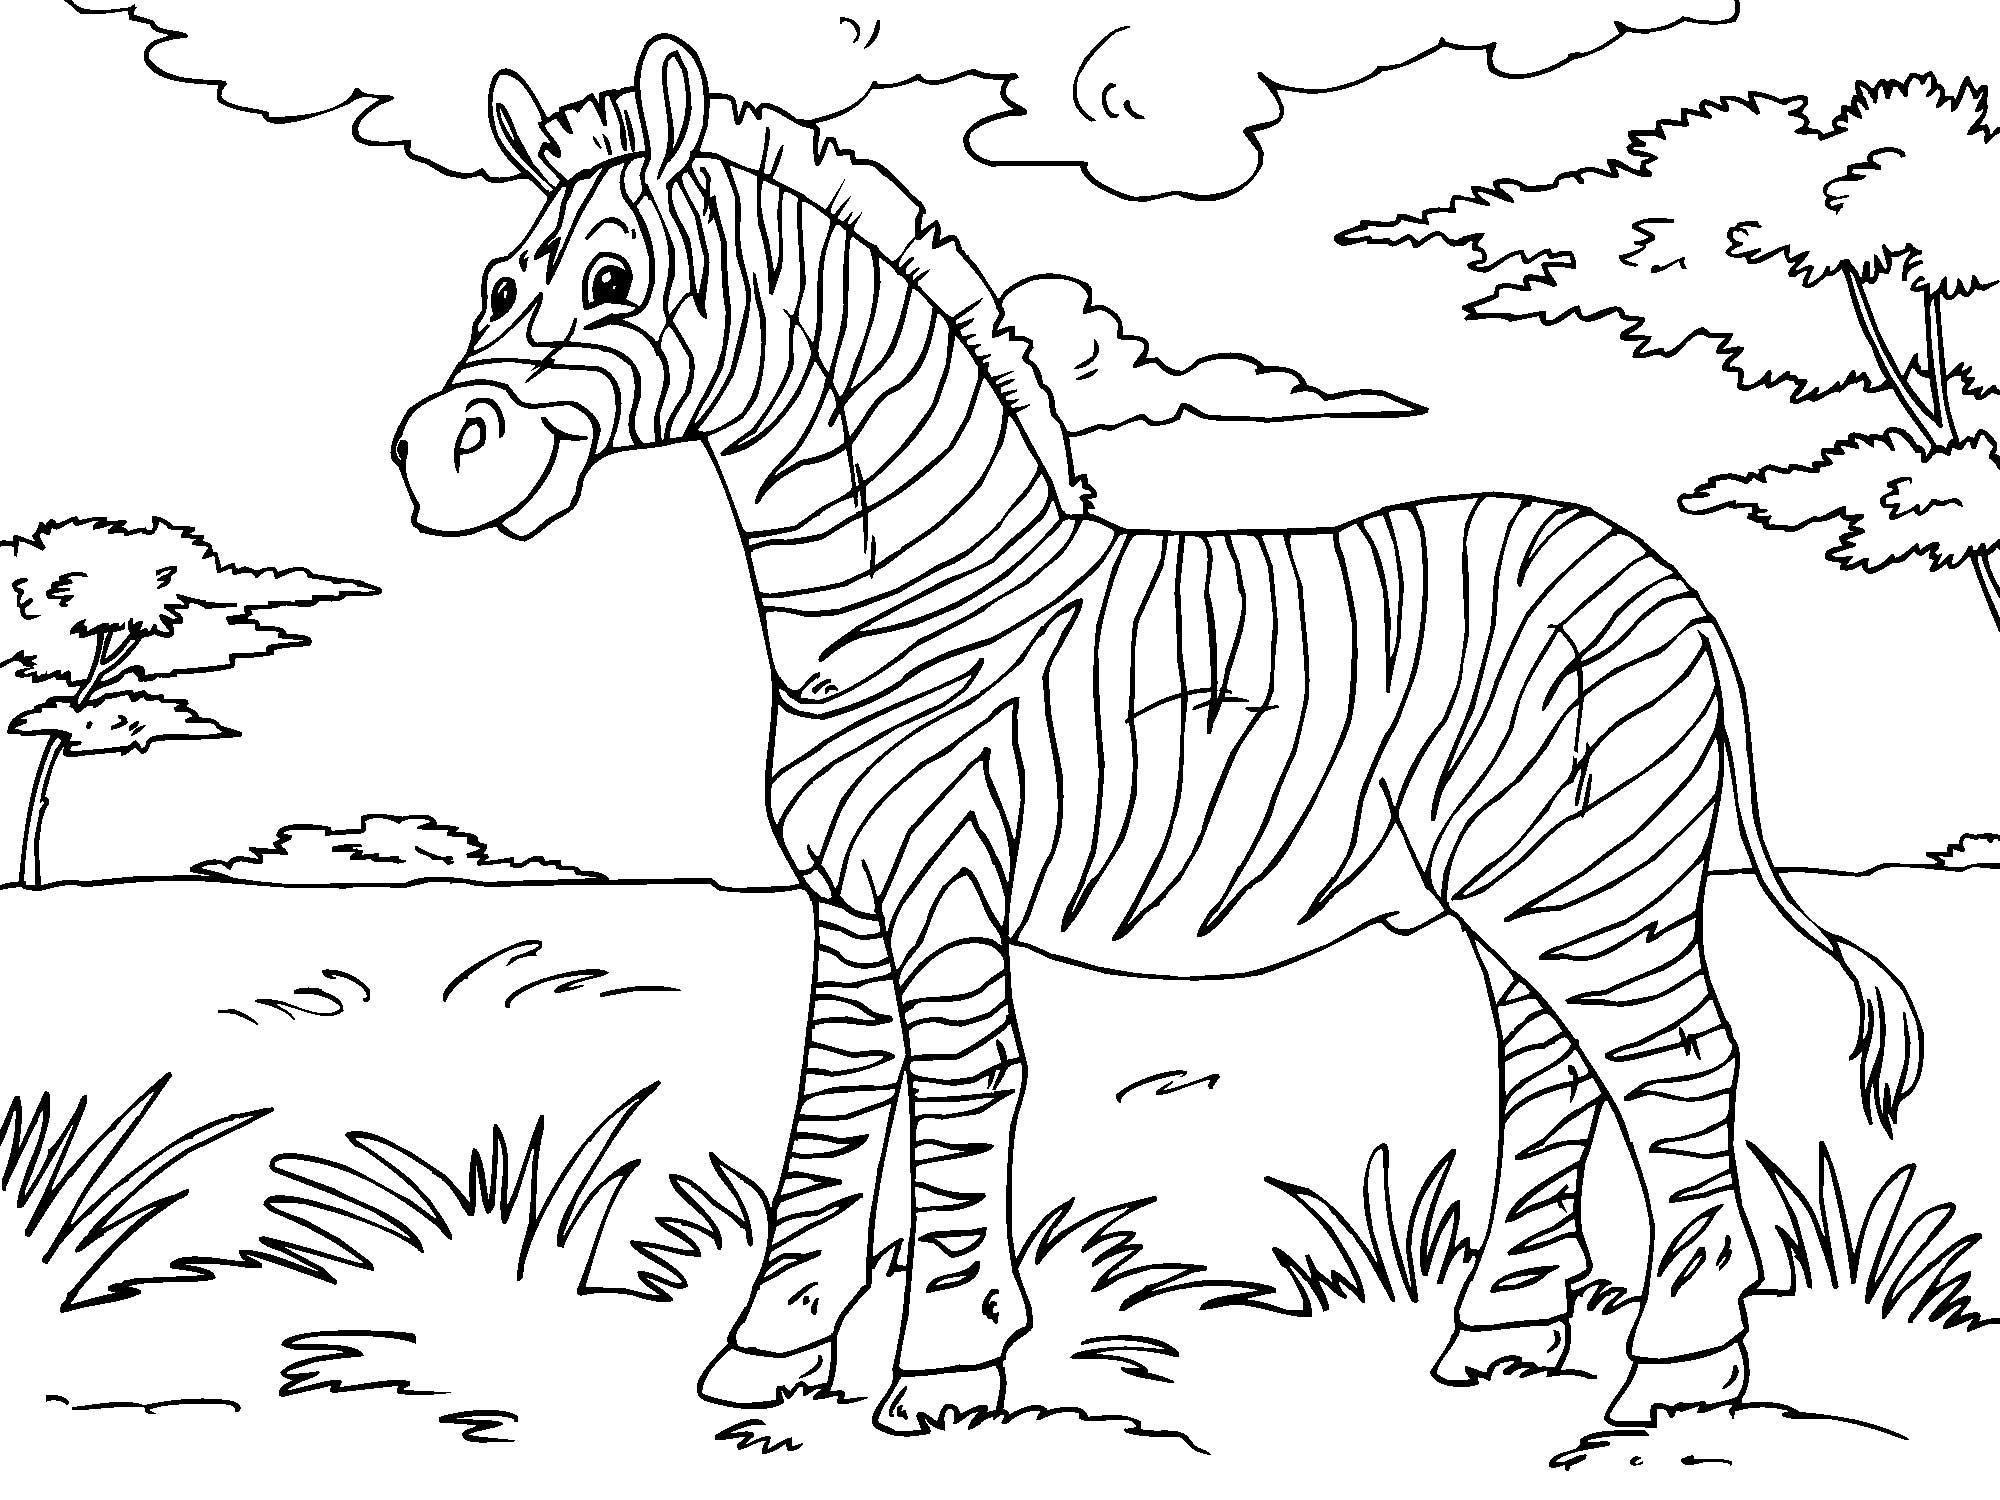 Malvorlage Zebra | Ausmalbild 23013.